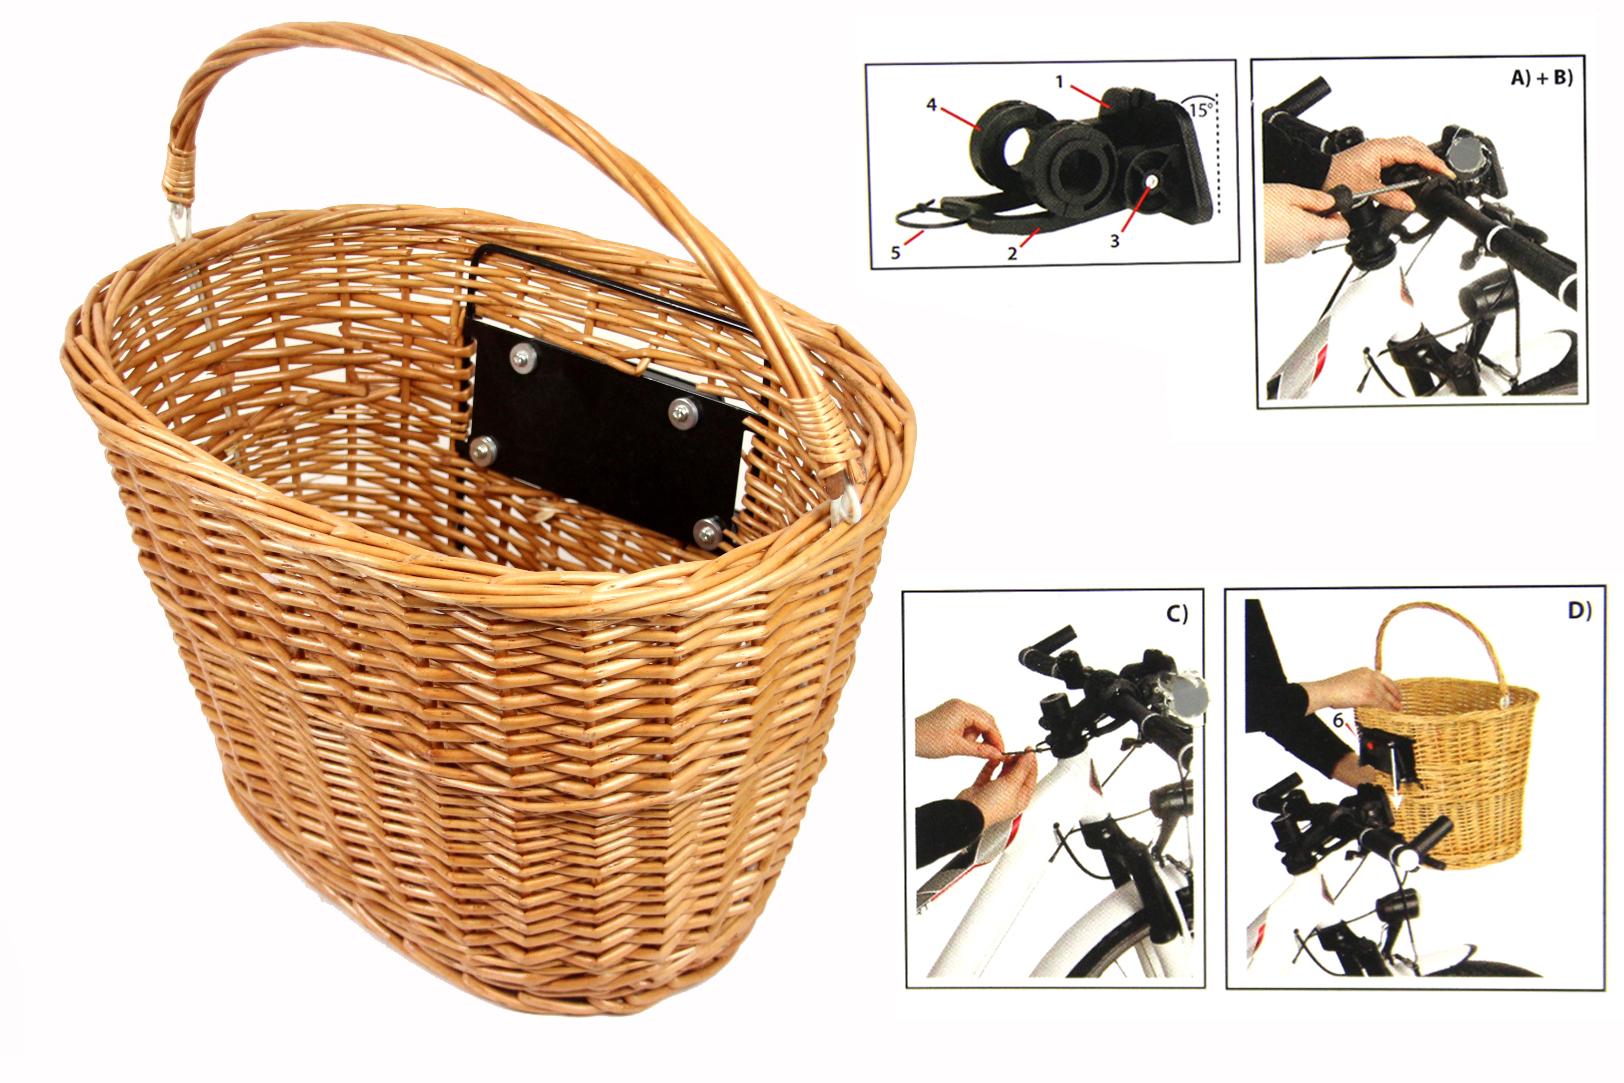 fahrradkorb mit clip klick halterung weidenkorb lenkerkorb. Black Bedroom Furniture Sets. Home Design Ideas